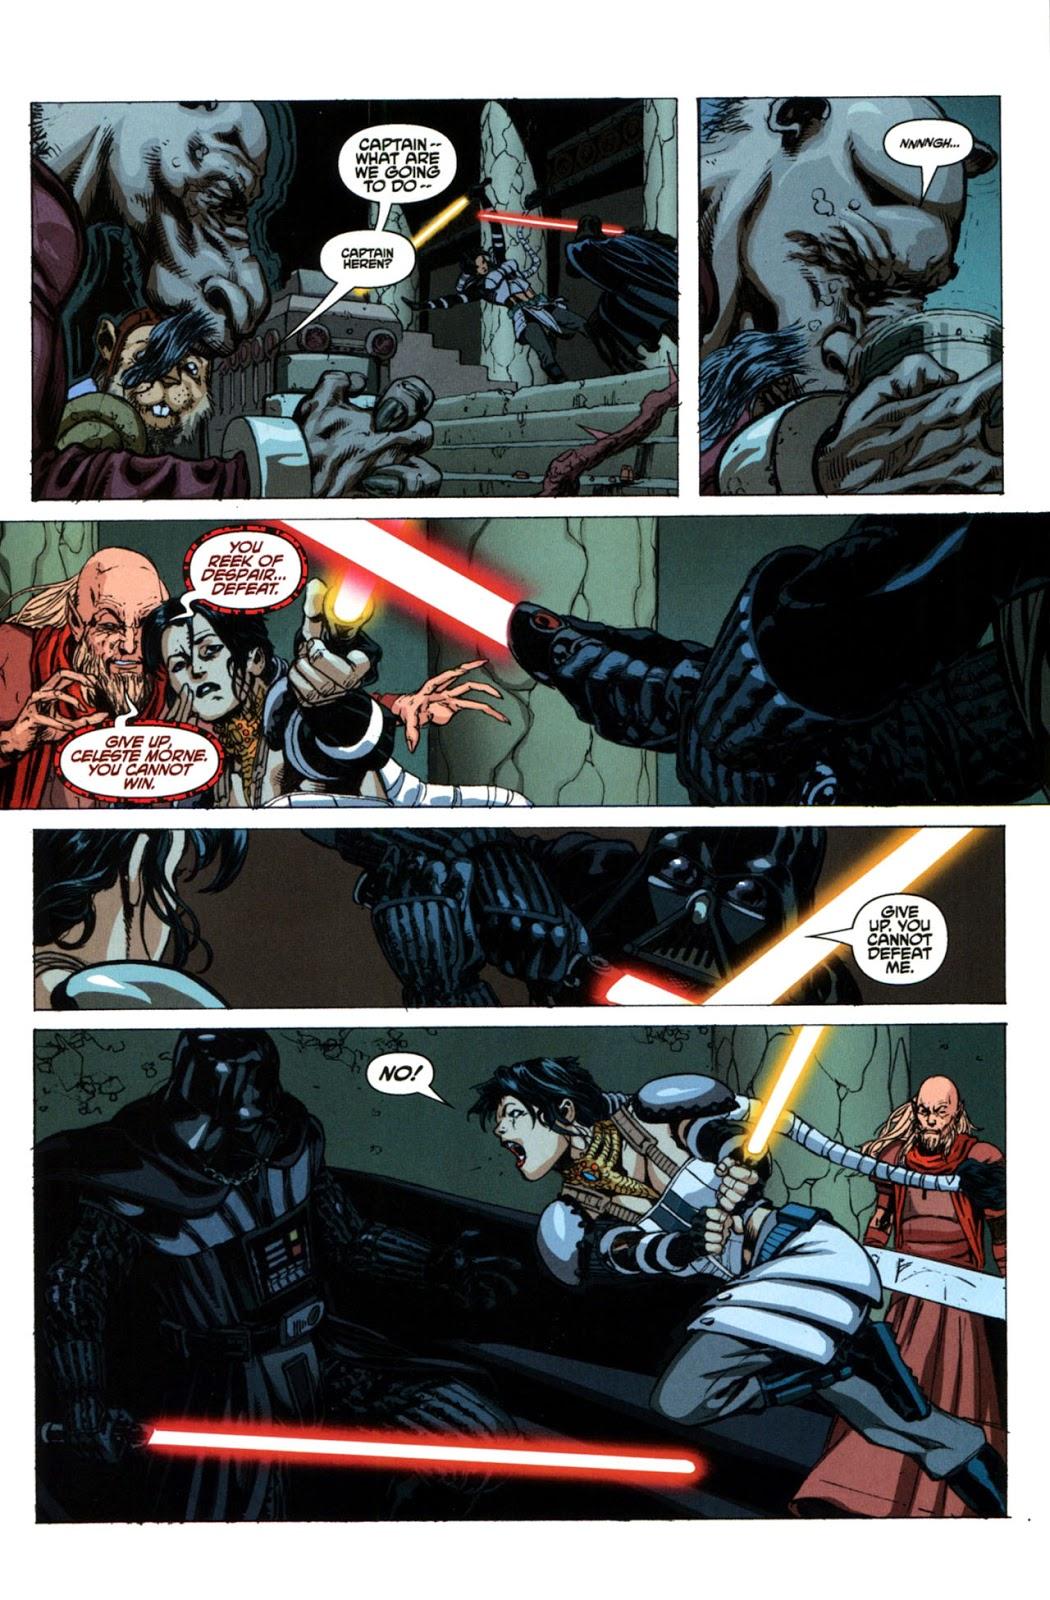 Darth Vader vs A'Sharad Hett - Page 3 M1IrbHsSM-0QfByH2x3SWv9alCJLRDeLz6wwJFdN1T0Jrz_2pV_kwSWqbq2mMVgCWrxTyFHLJ8GRpgxPWfd297RqbXrnC8ehb9h6KZR6HcXZpXdXMuw-MK_xDhg-F6TyX3WHgSTr